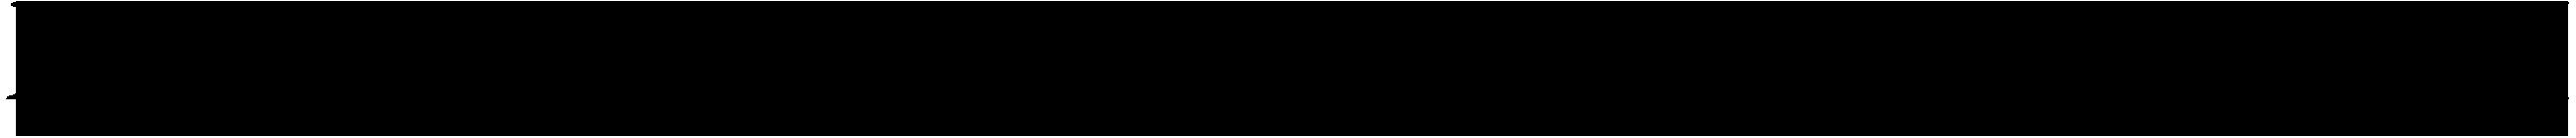 brixton-outline-specimen